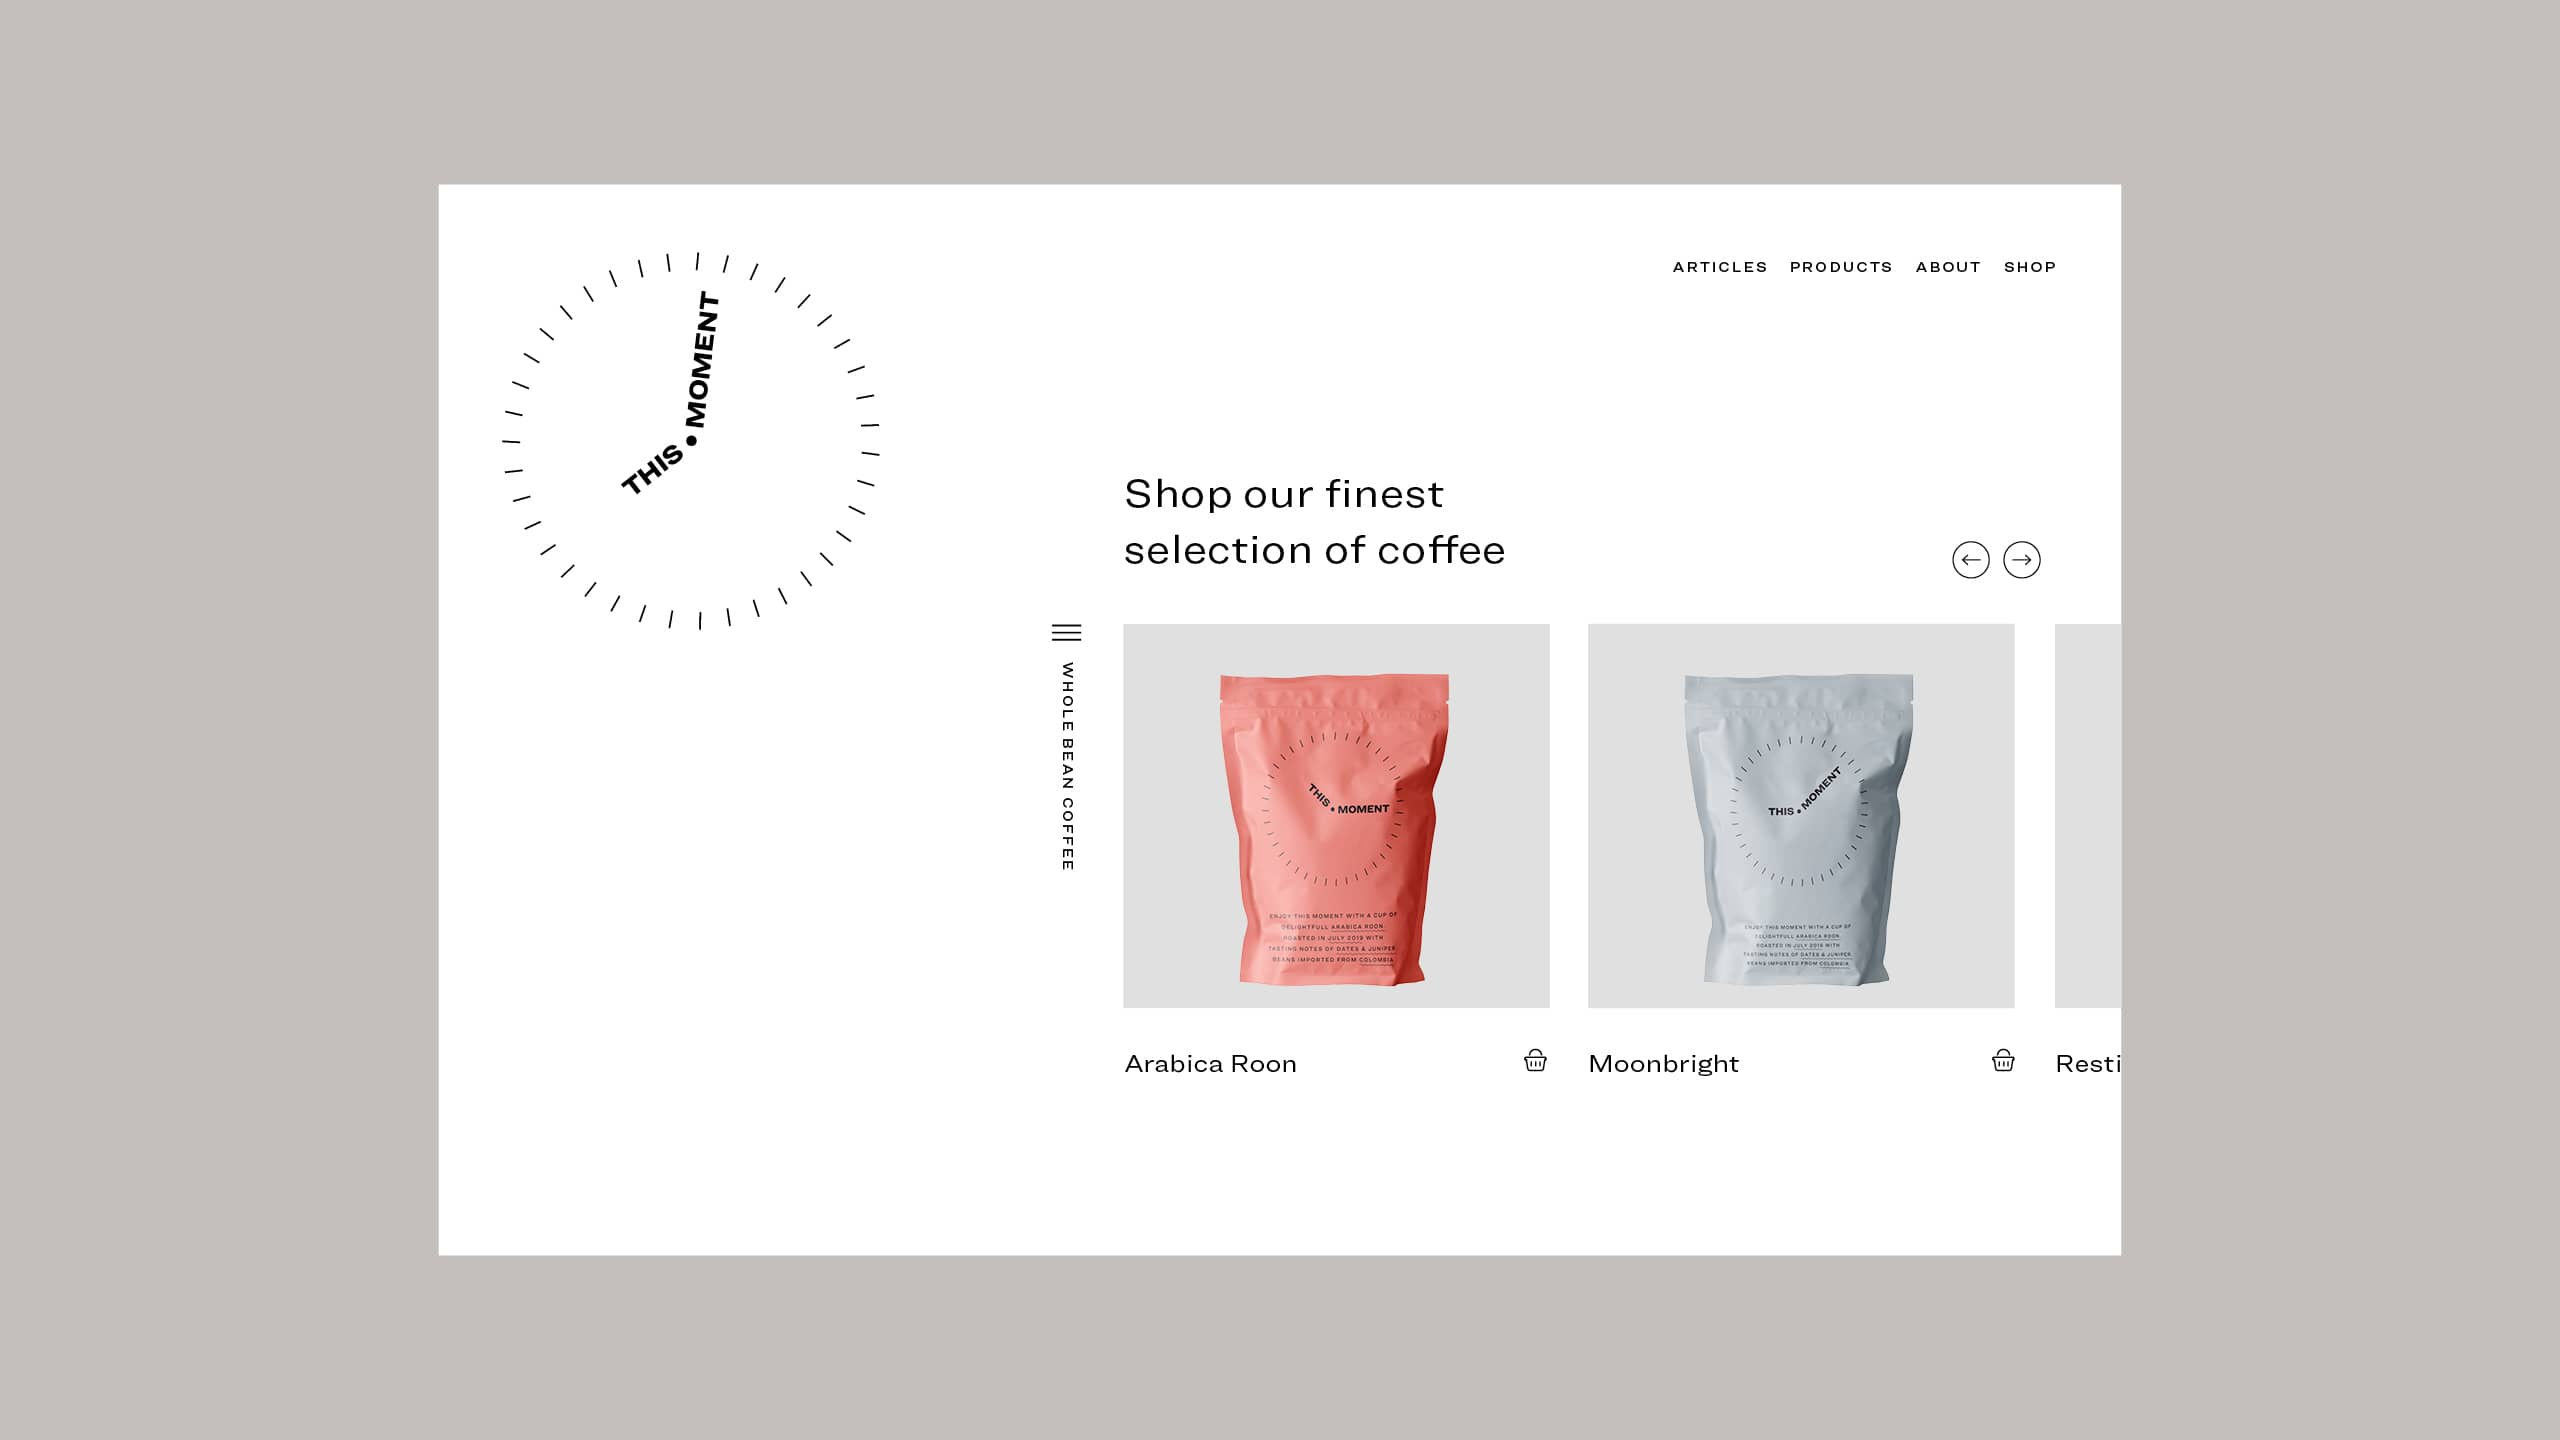 mantik-digital-branding-development-agency-creative-app-ui-web-branding-19-min-2